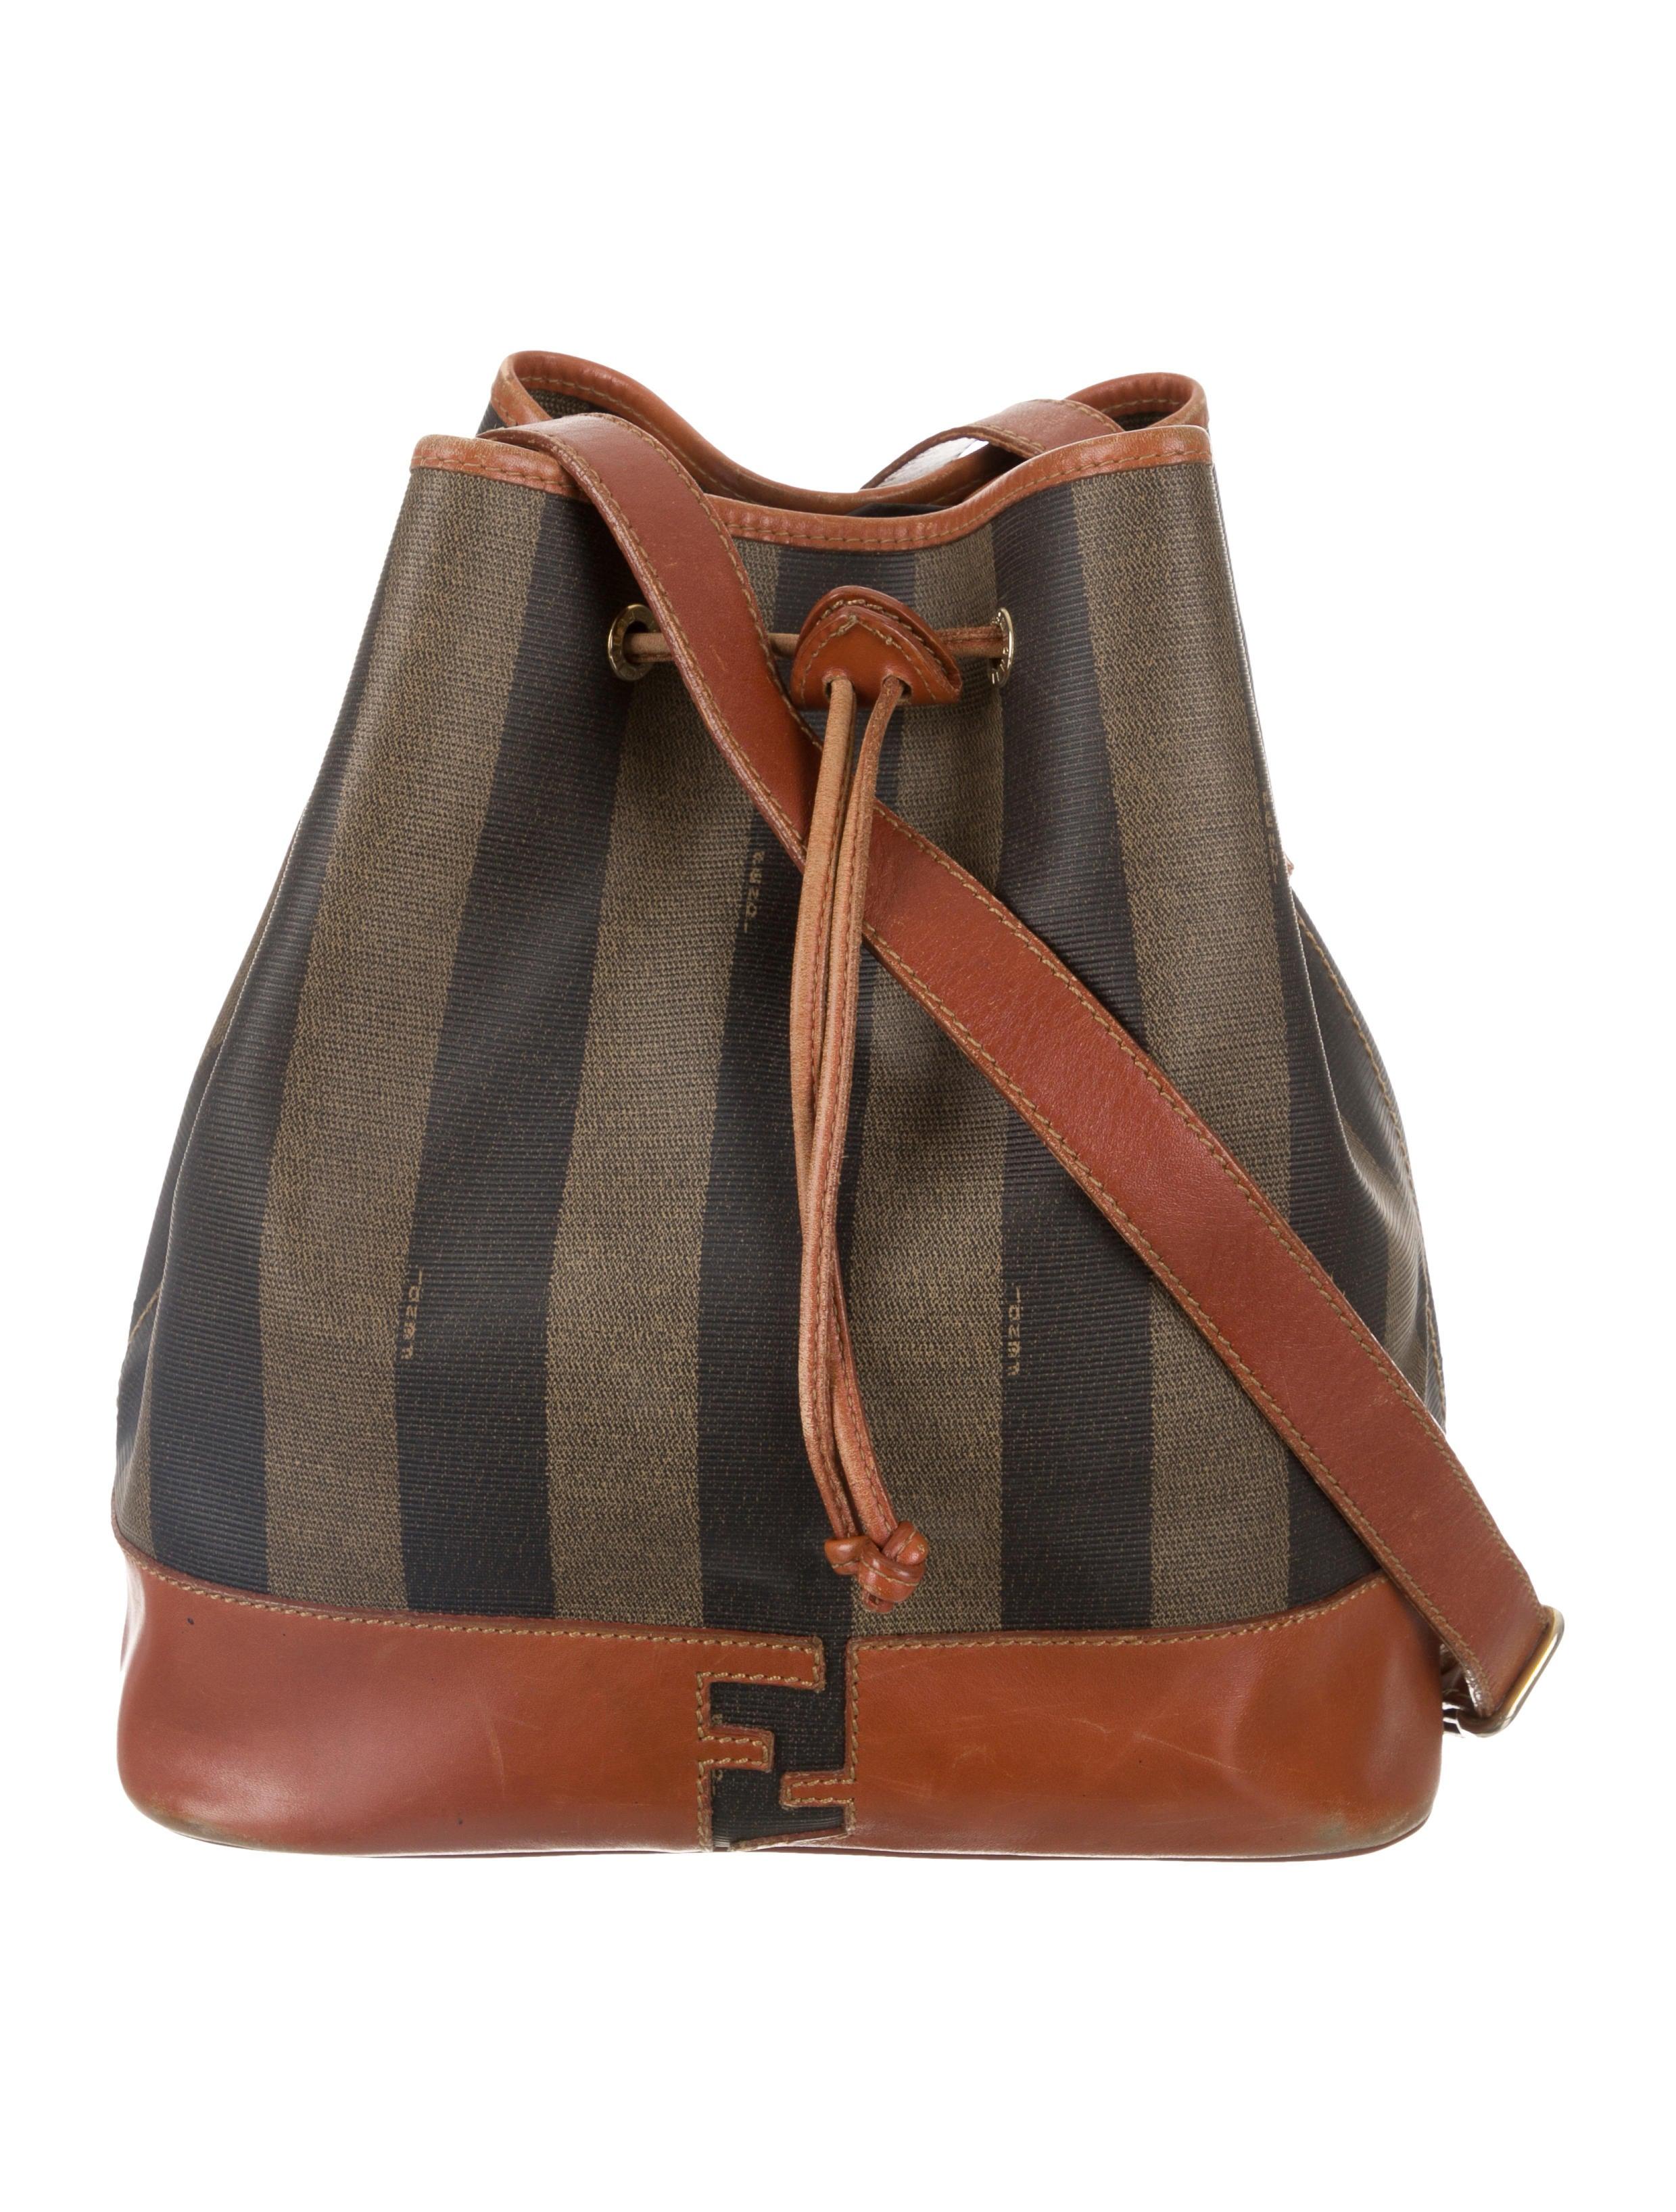 Fendi Vintage Pequin Bucket Bag Handbags Fen125419 The Realreal